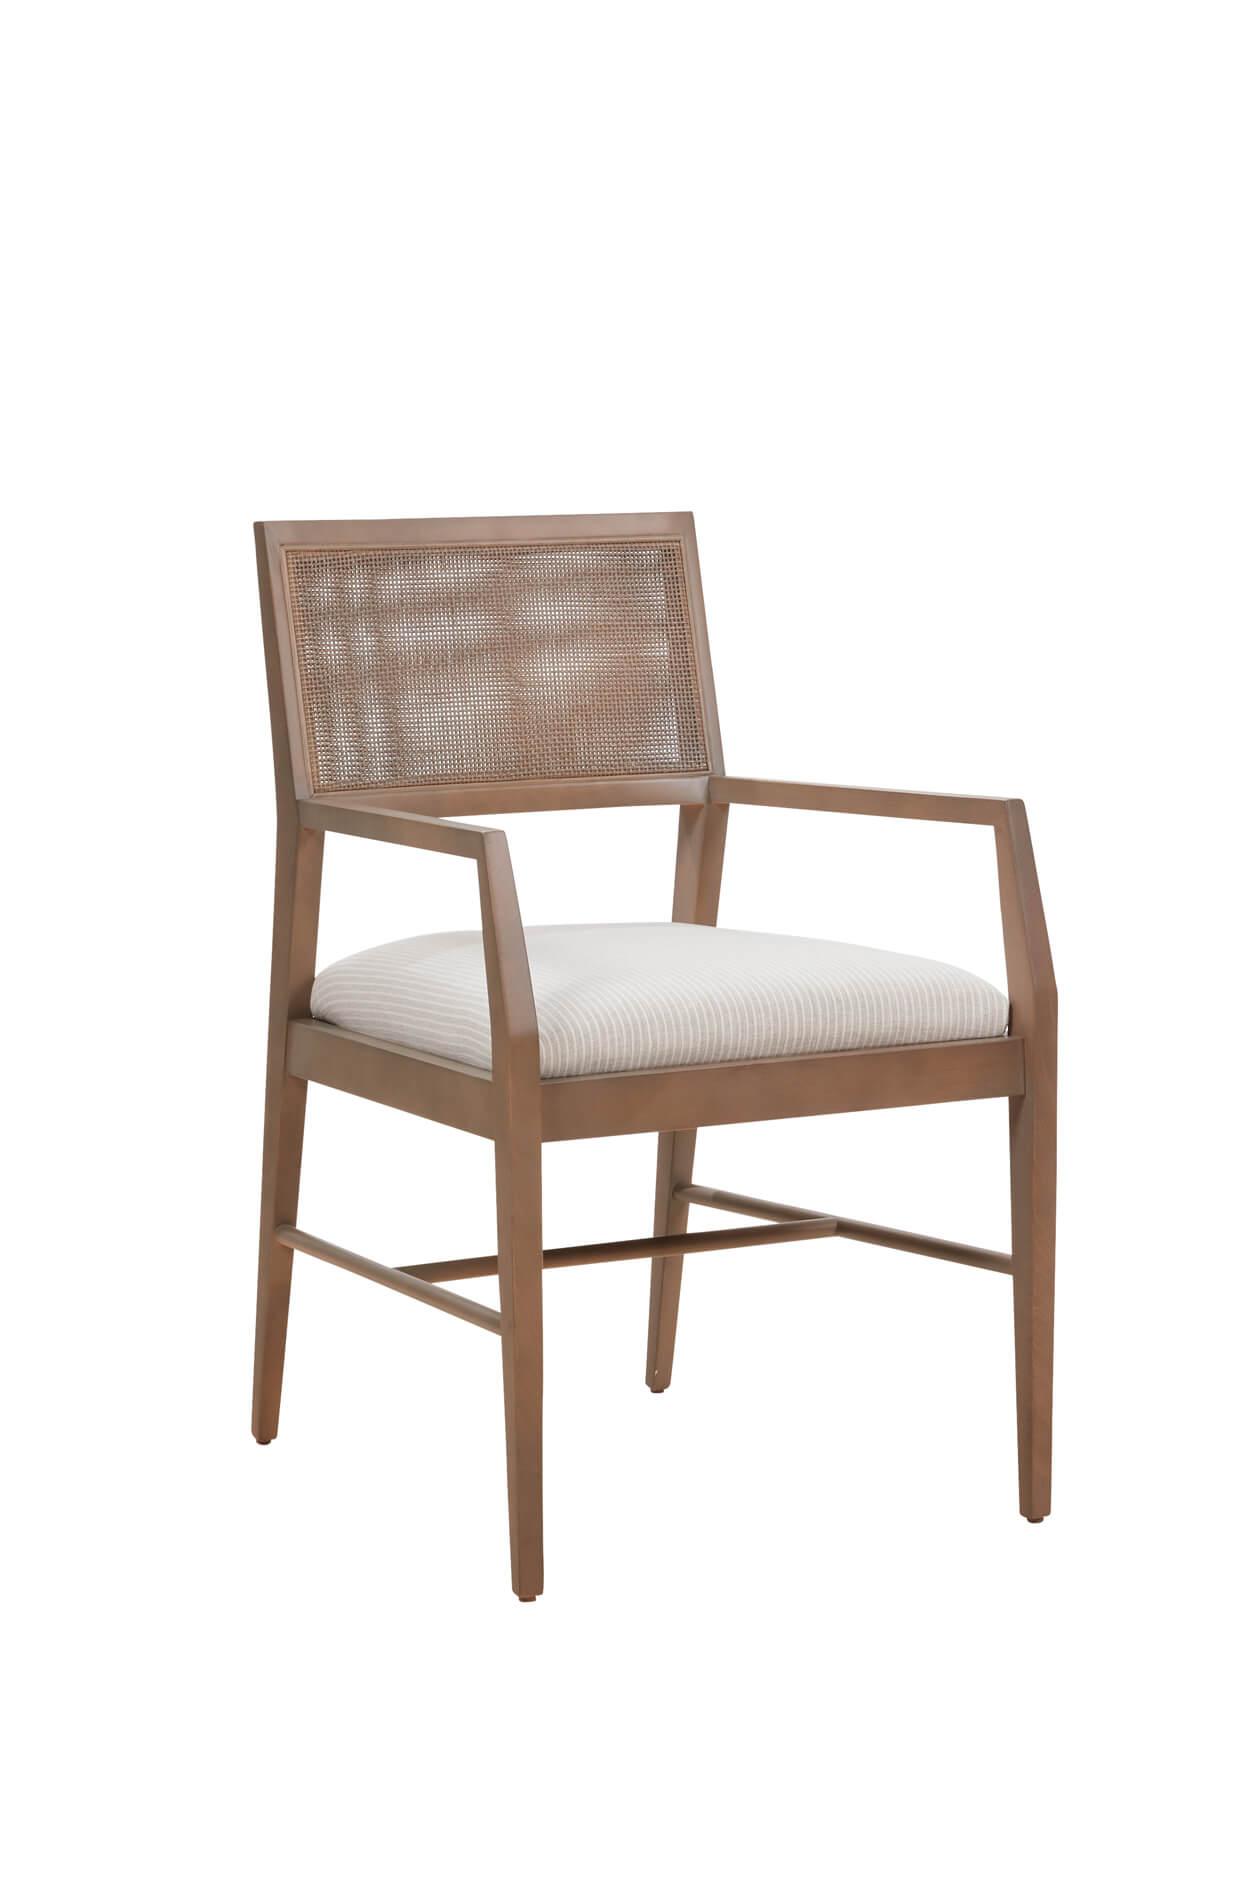 Fairfield's Larson Upholstered Dining Chair